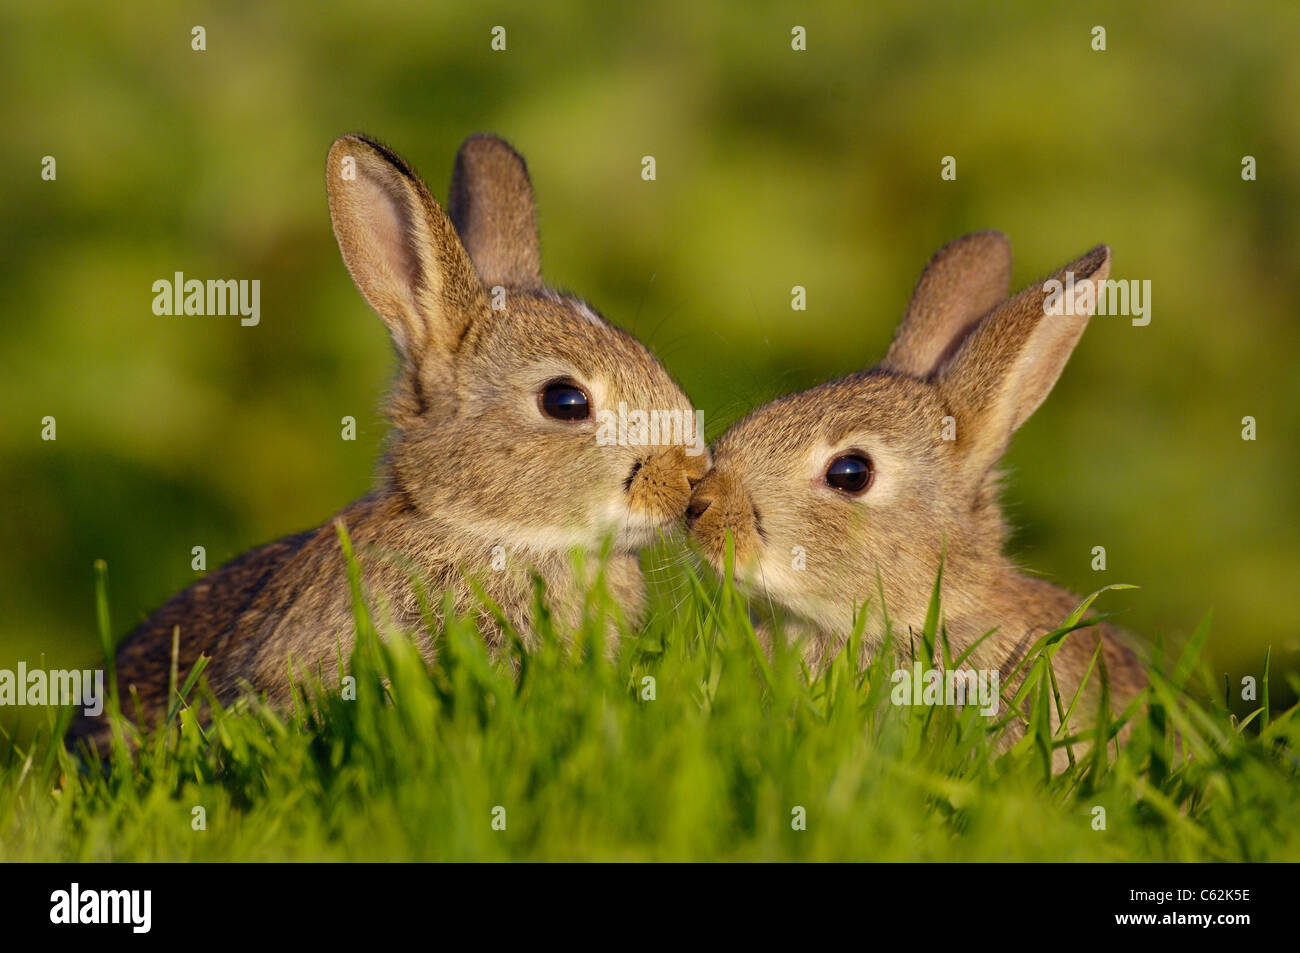 Conejo Oryctolagus cuniculus un par de conejos jóvenes, o gatitos, toque brevemente narices en un momento emotivo Imagen De Stock